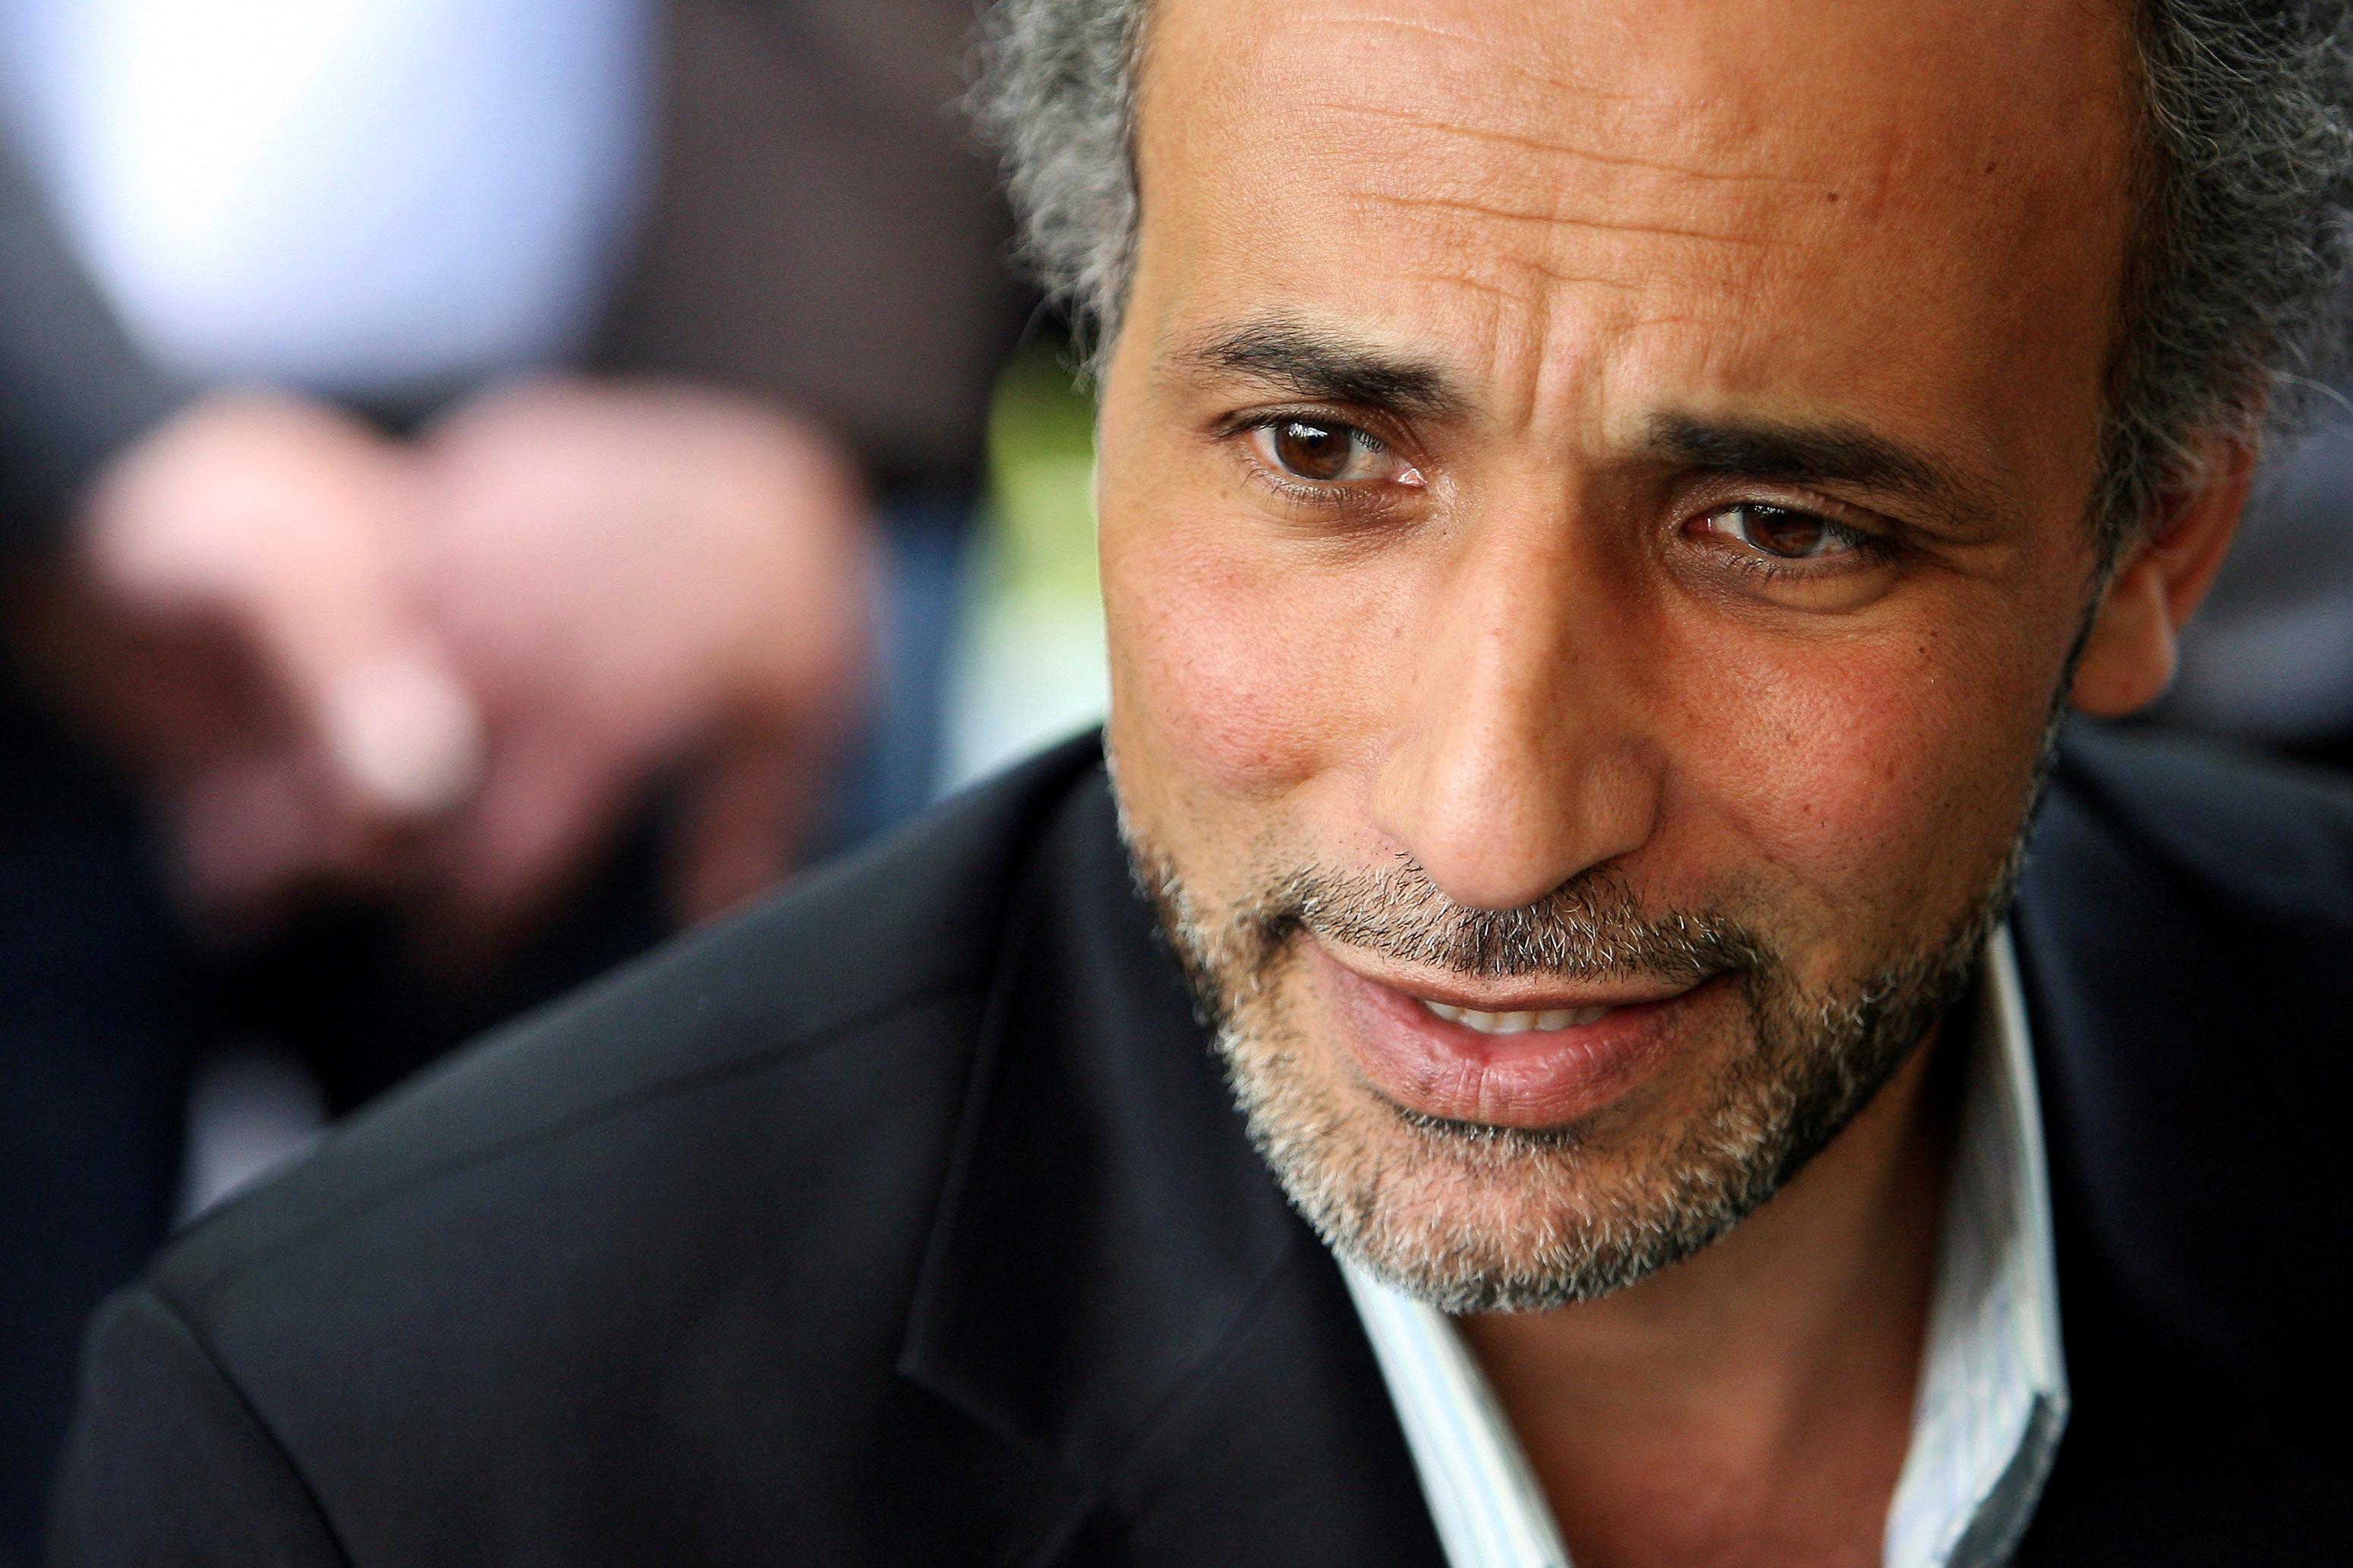 Oxford Islamic scholar Ramadan admits to 'sex games', denies rape